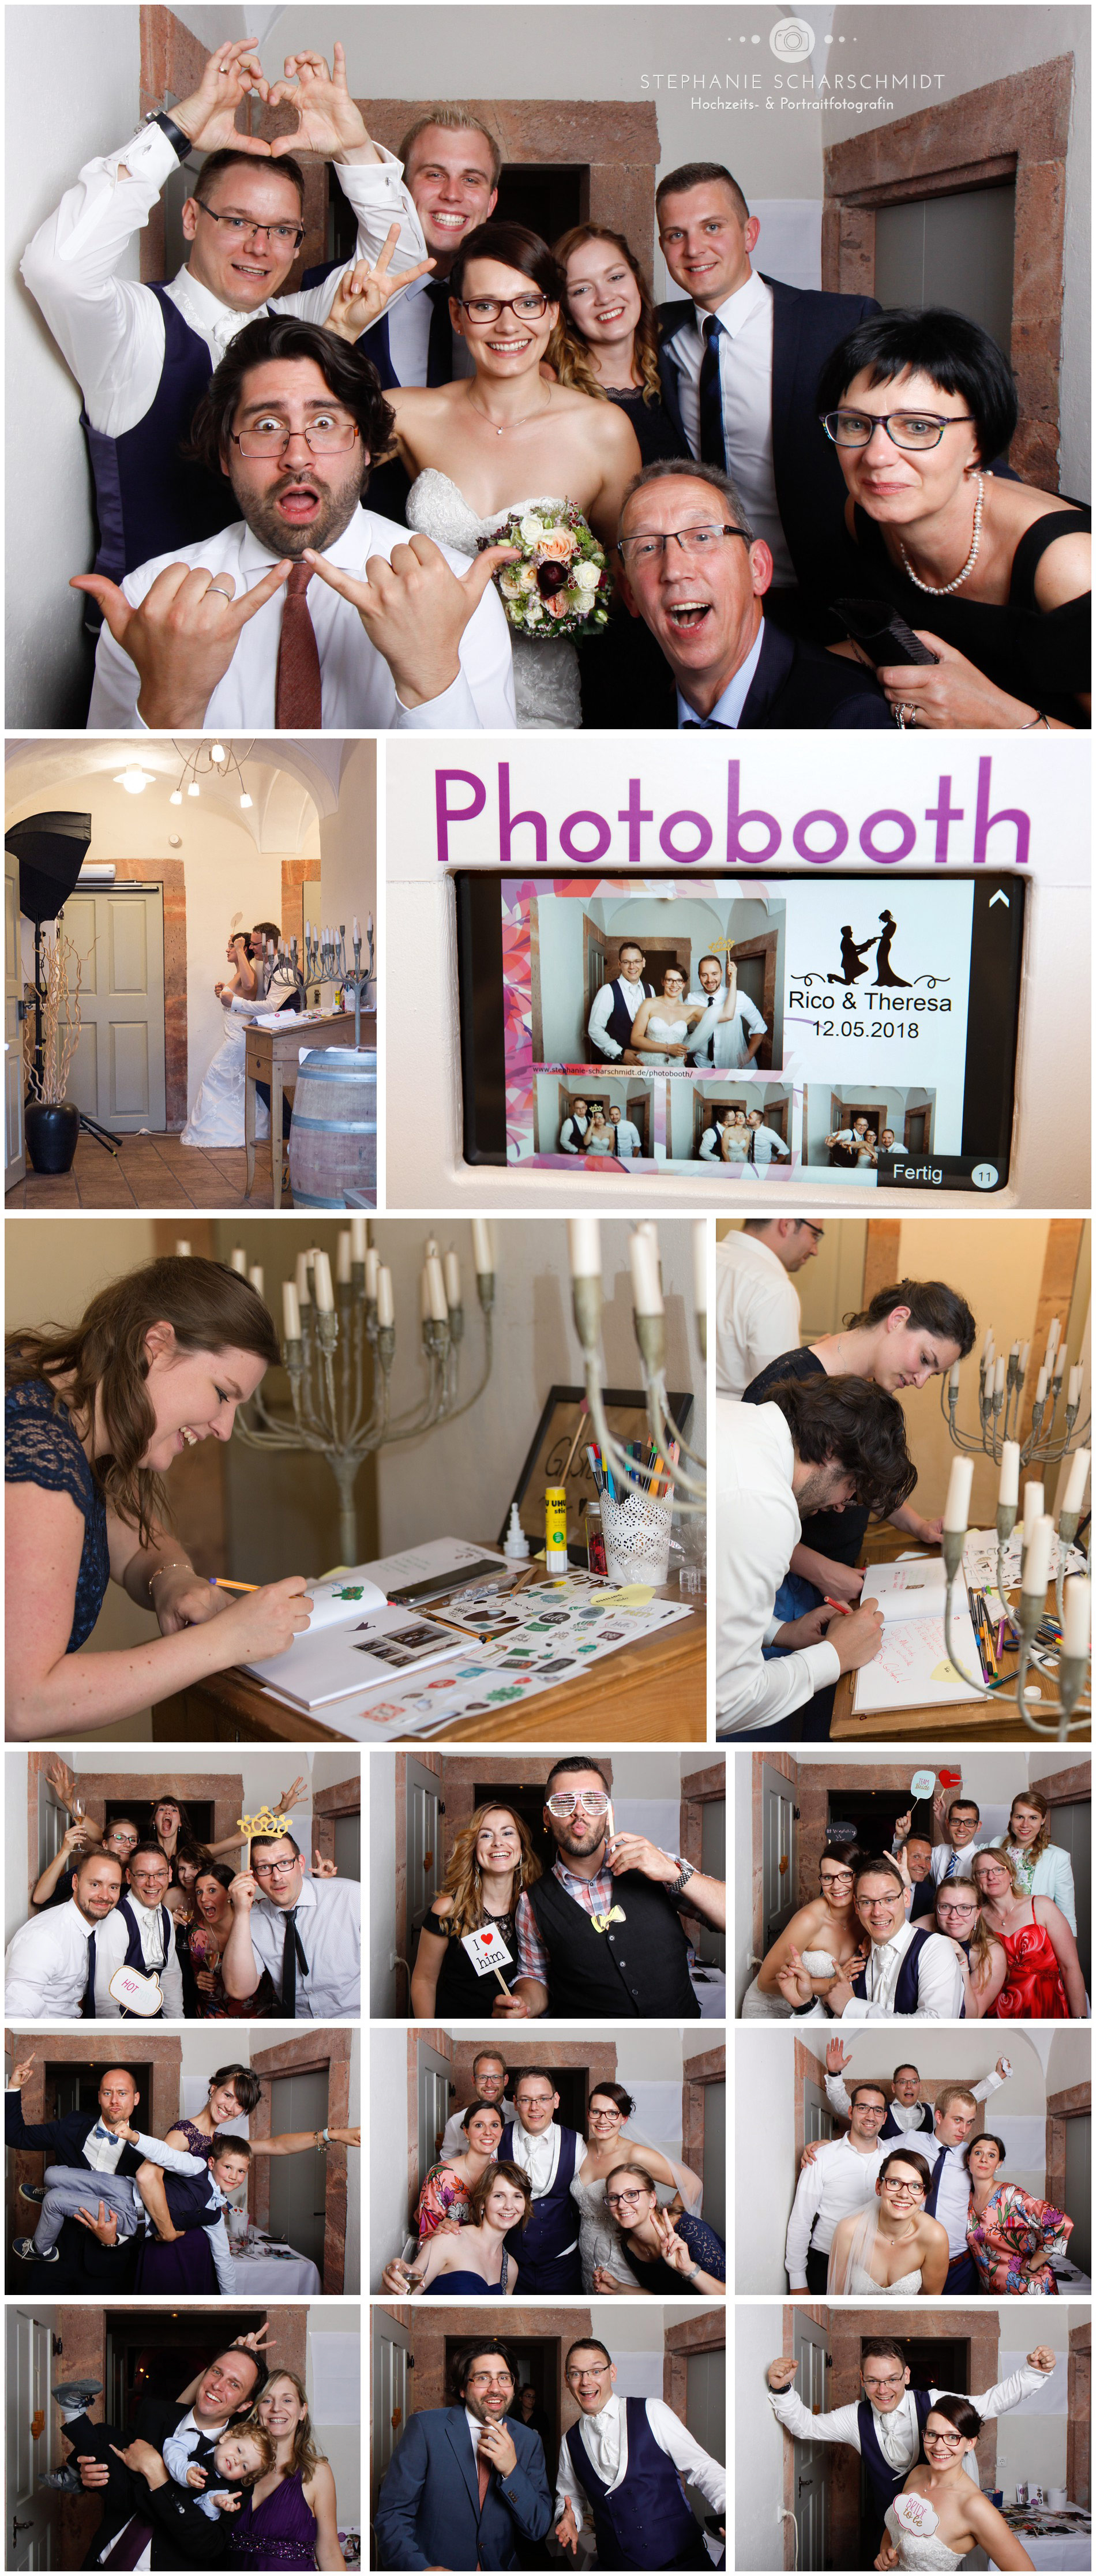 Photobooth Zwickau – Hochzeitsfotograf Stephanie Scharschmidt